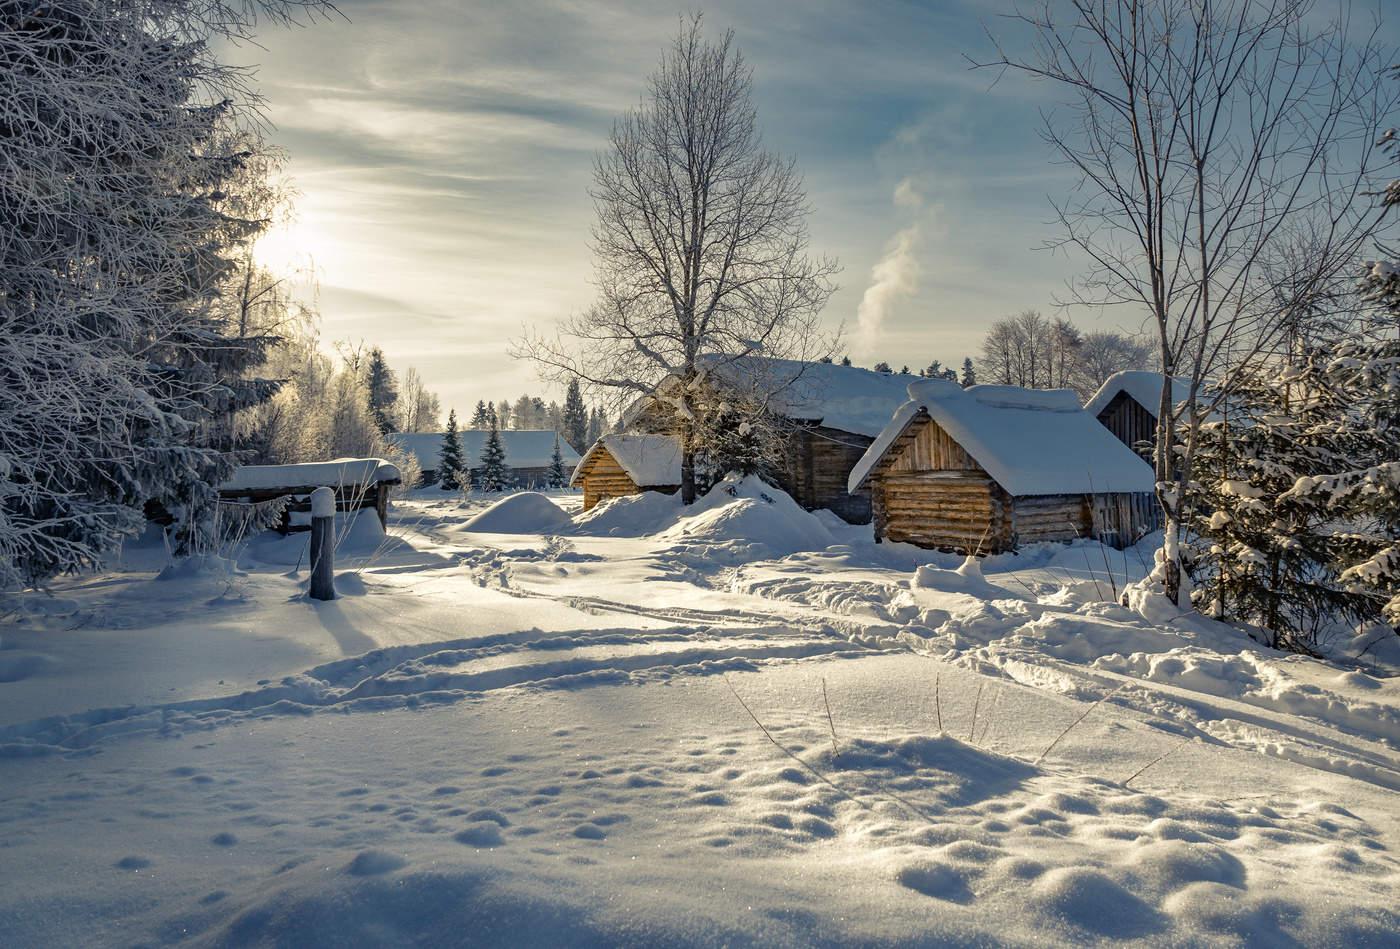 День села, картинки зима в деревне